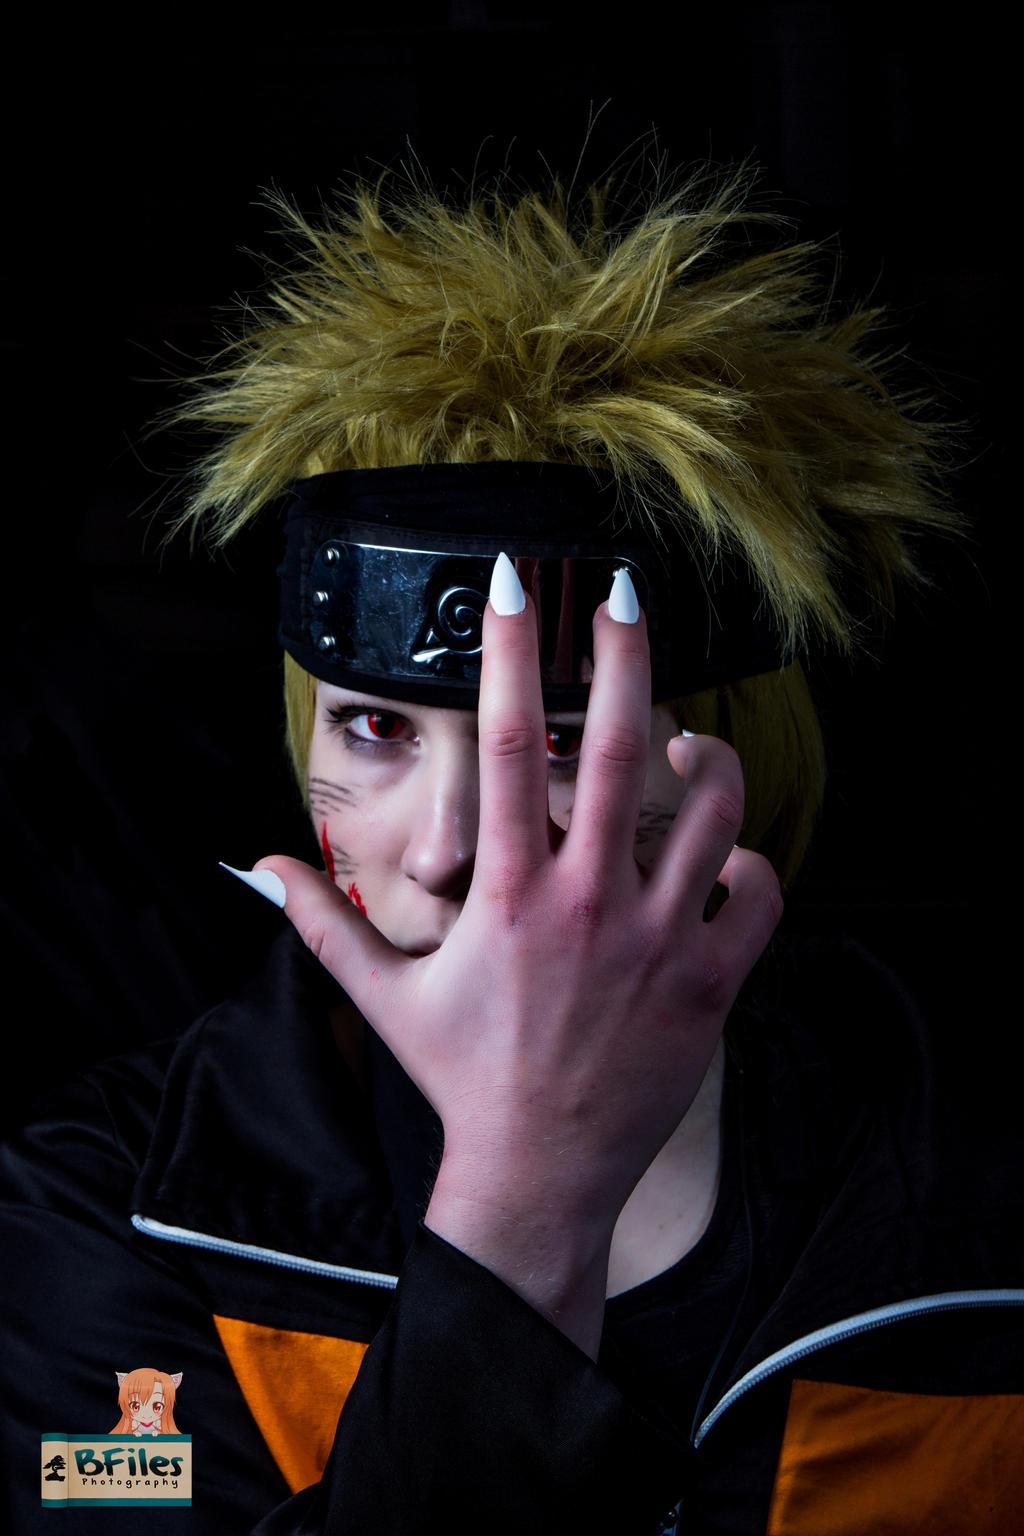 Naruto: dark side by AkuroBaisotei